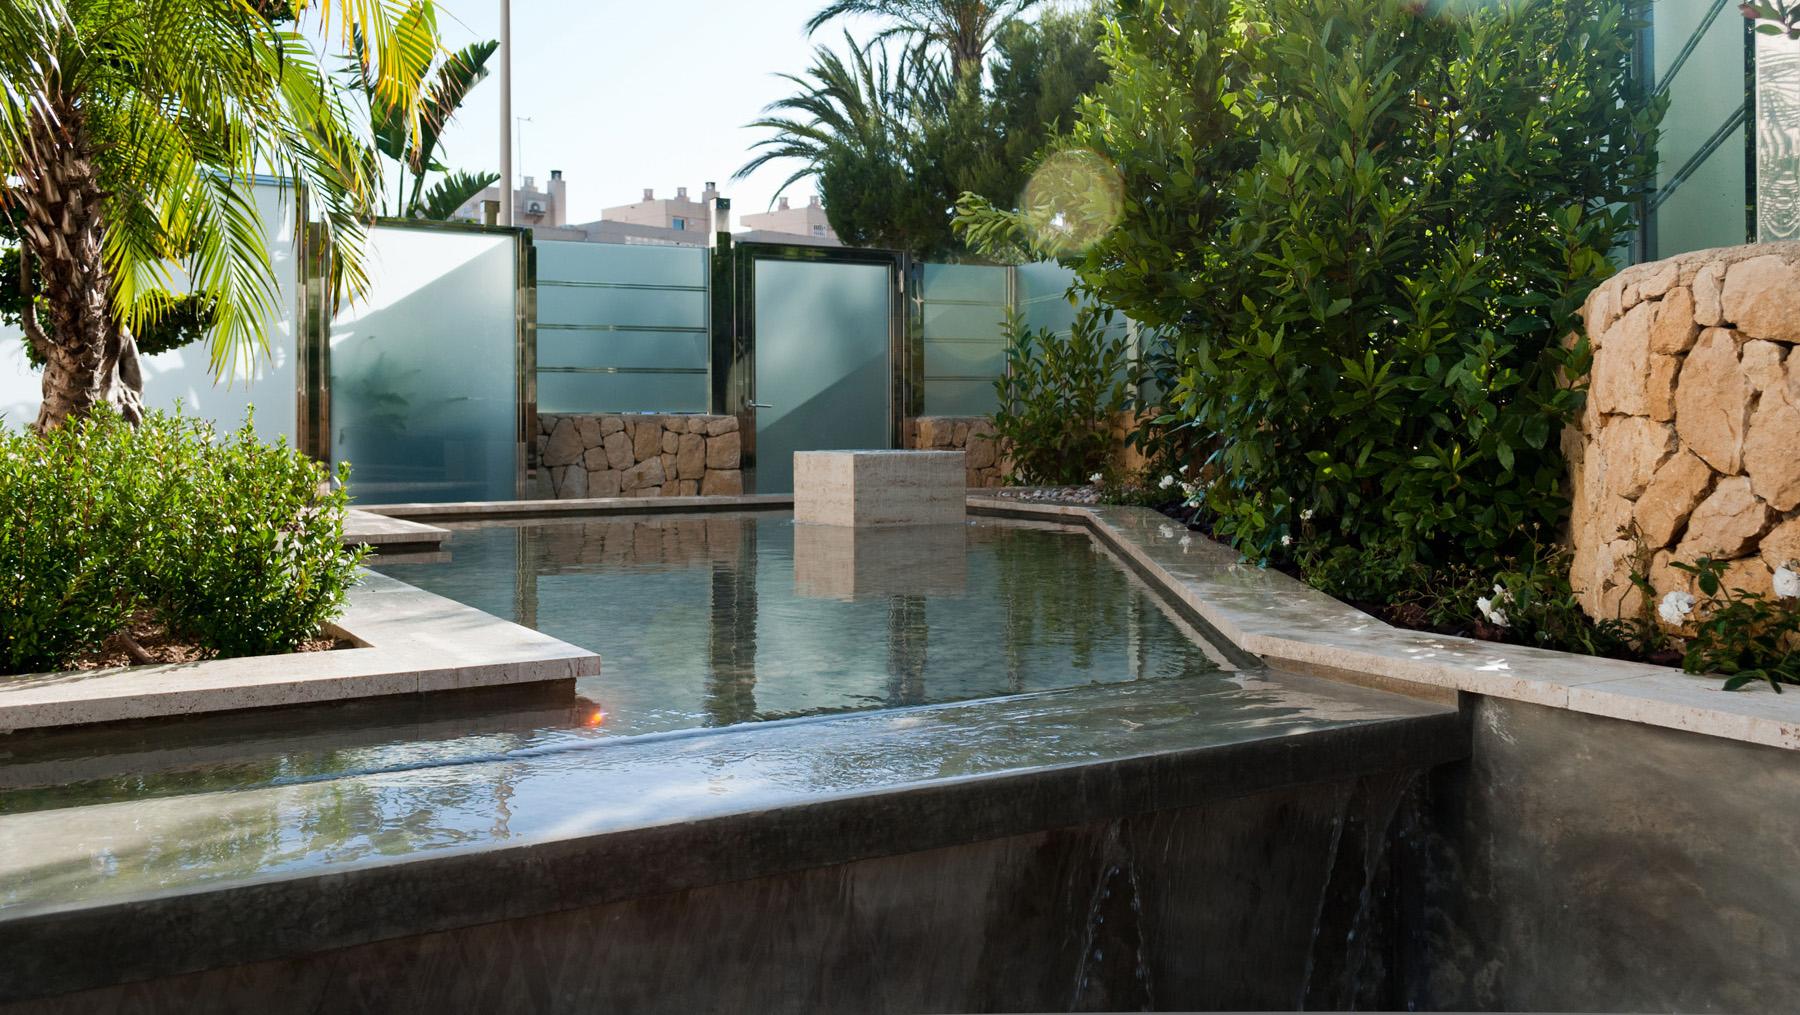 diseno de jardin zen con estanque david jim nez. Black Bedroom Furniture Sets. Home Design Ideas